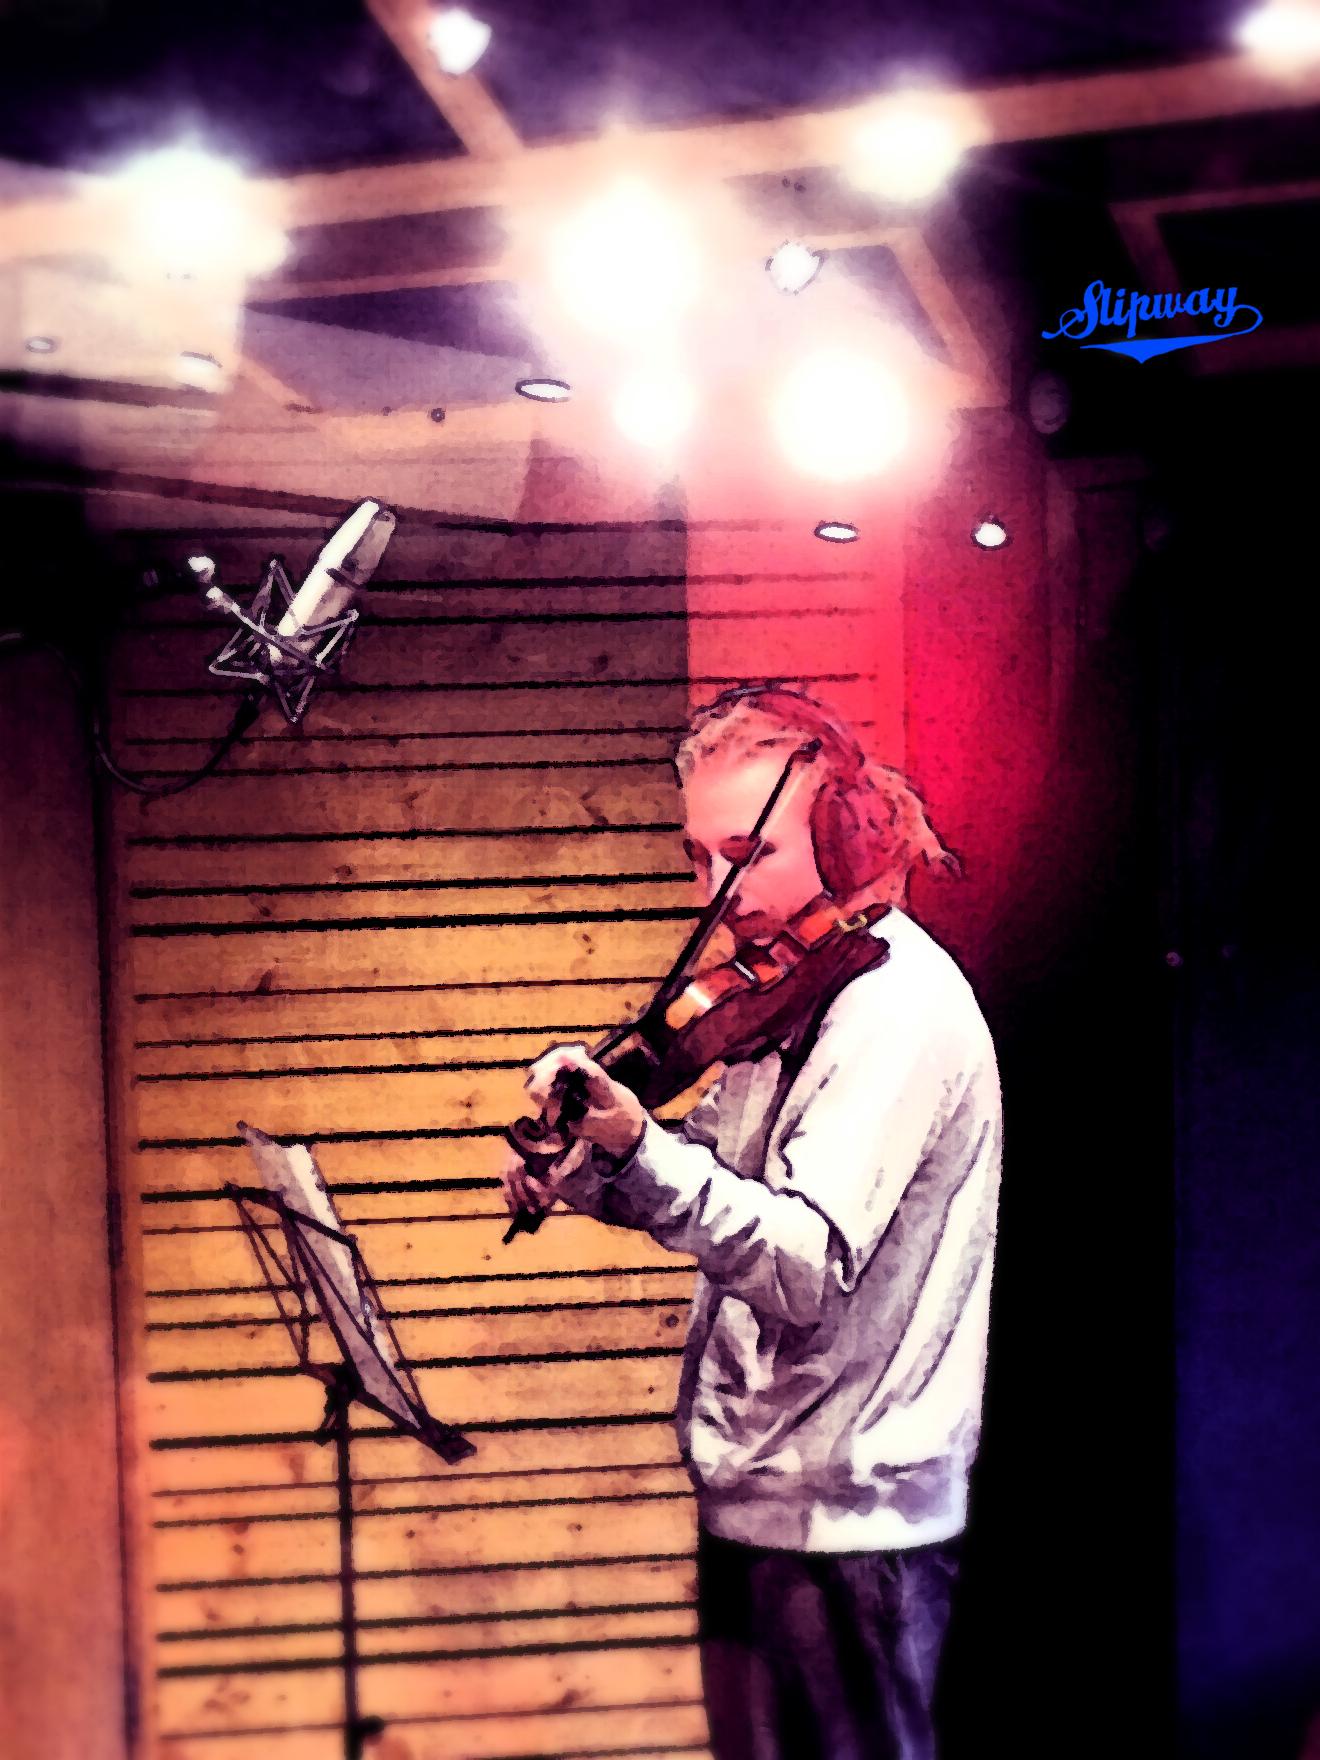 Slipway-Studio_Violin-Recording_03